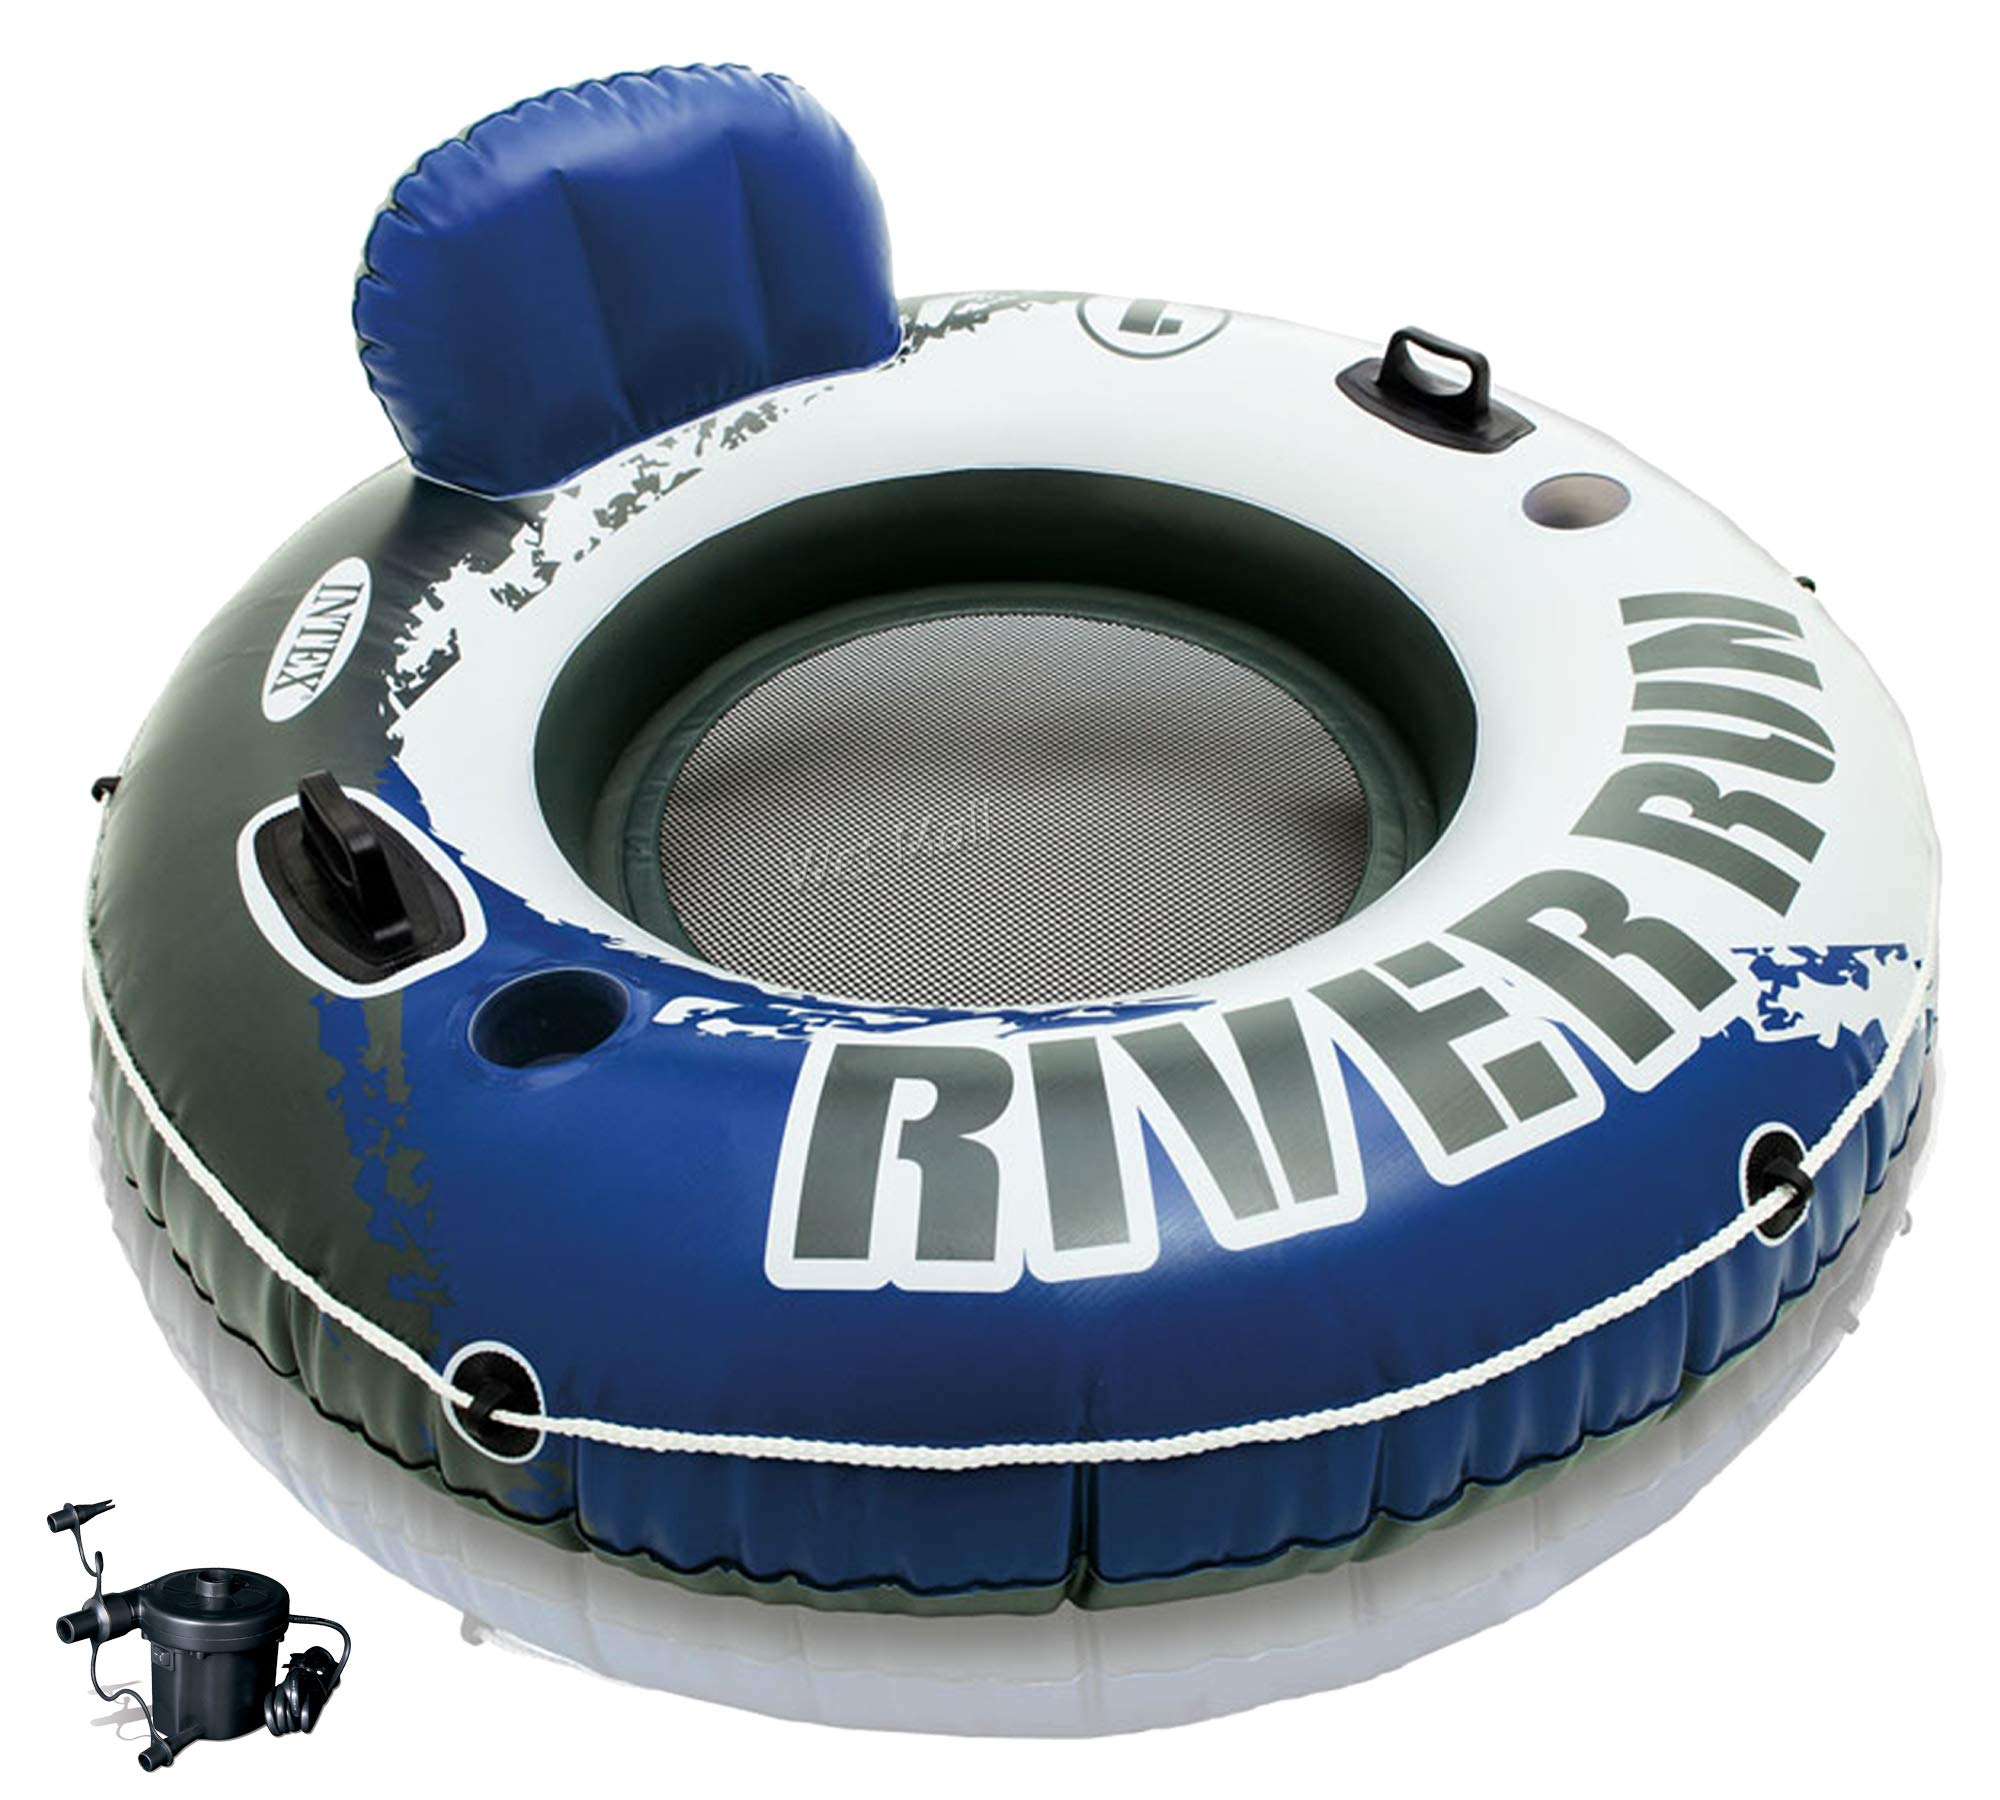 Intex River Run I Inflatable Floating Tube Raft Boat Set & Quick Fill Air Pump by Intex